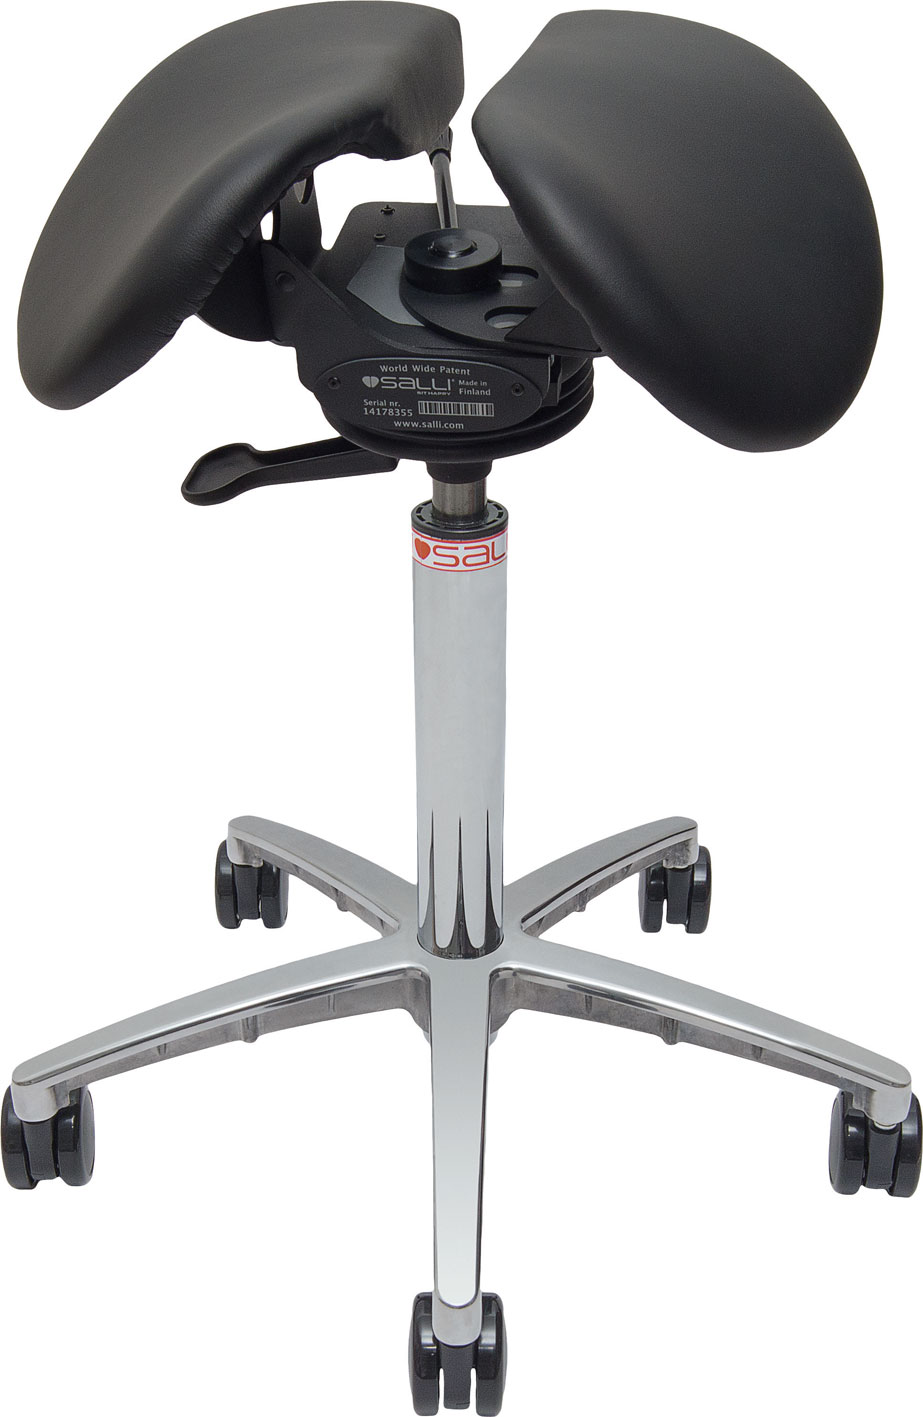 salli saddle chairs | salli saddle chair | salli uk dealer